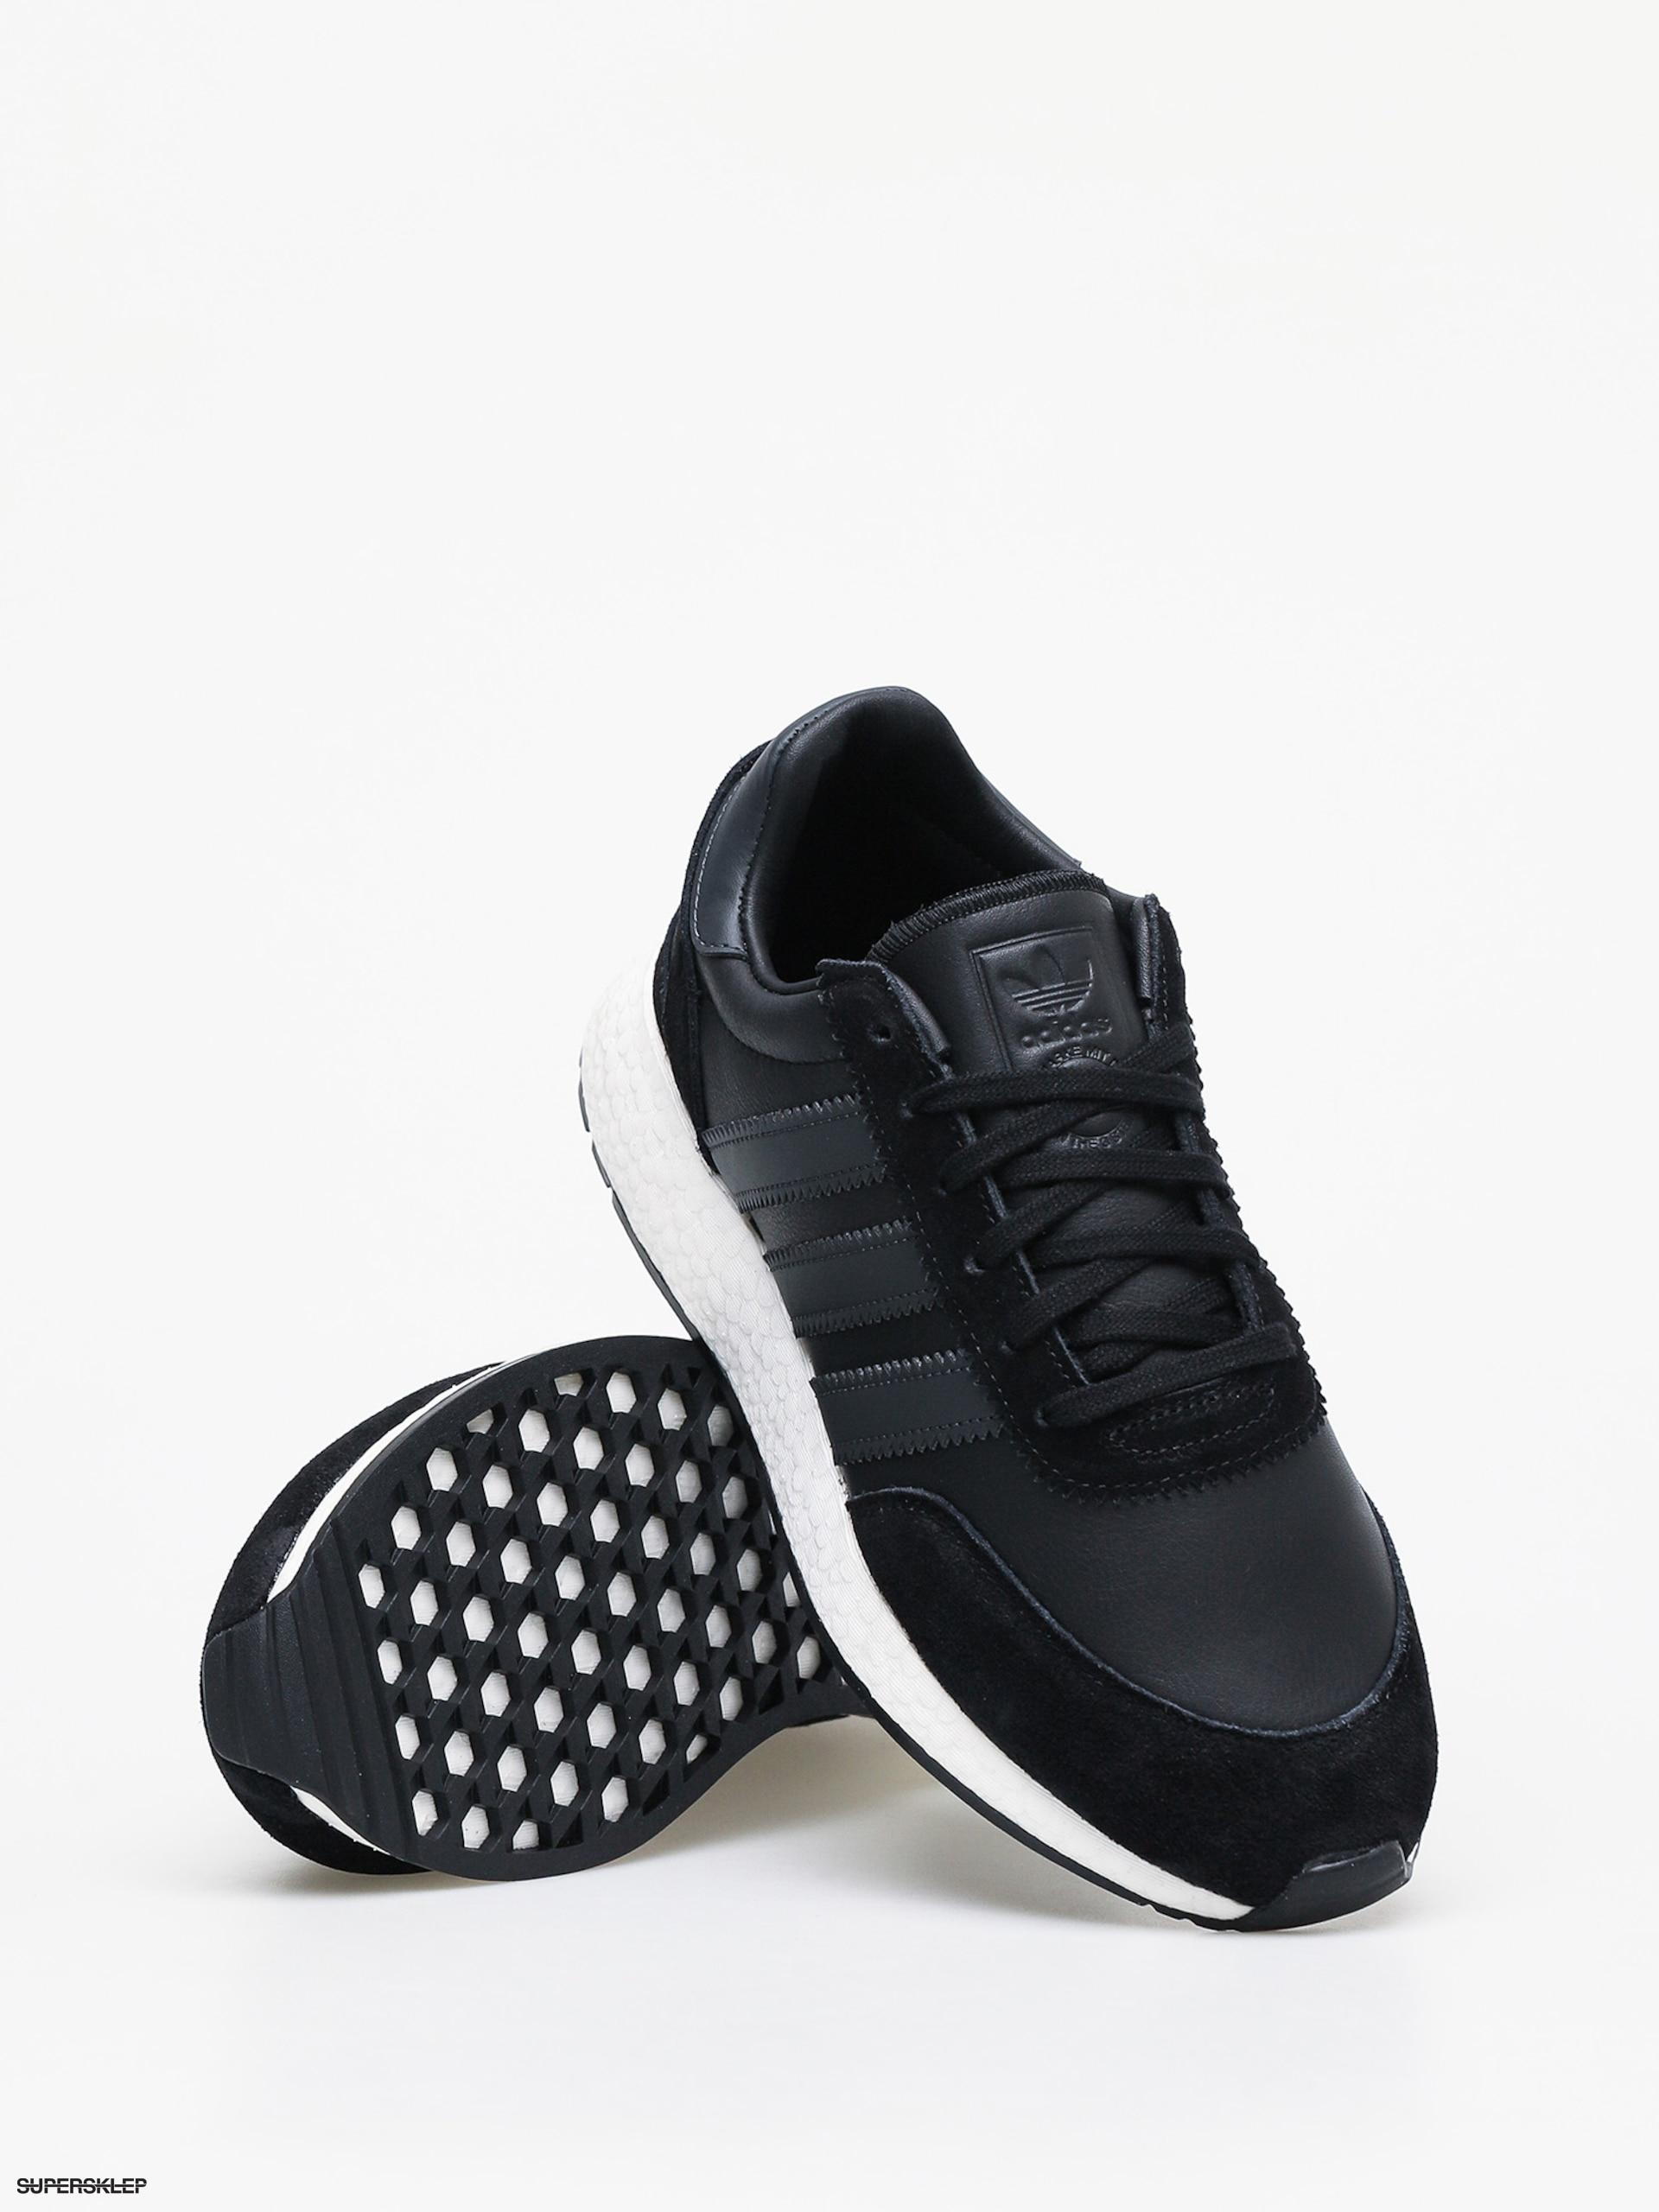 jak reklamować buty adidas